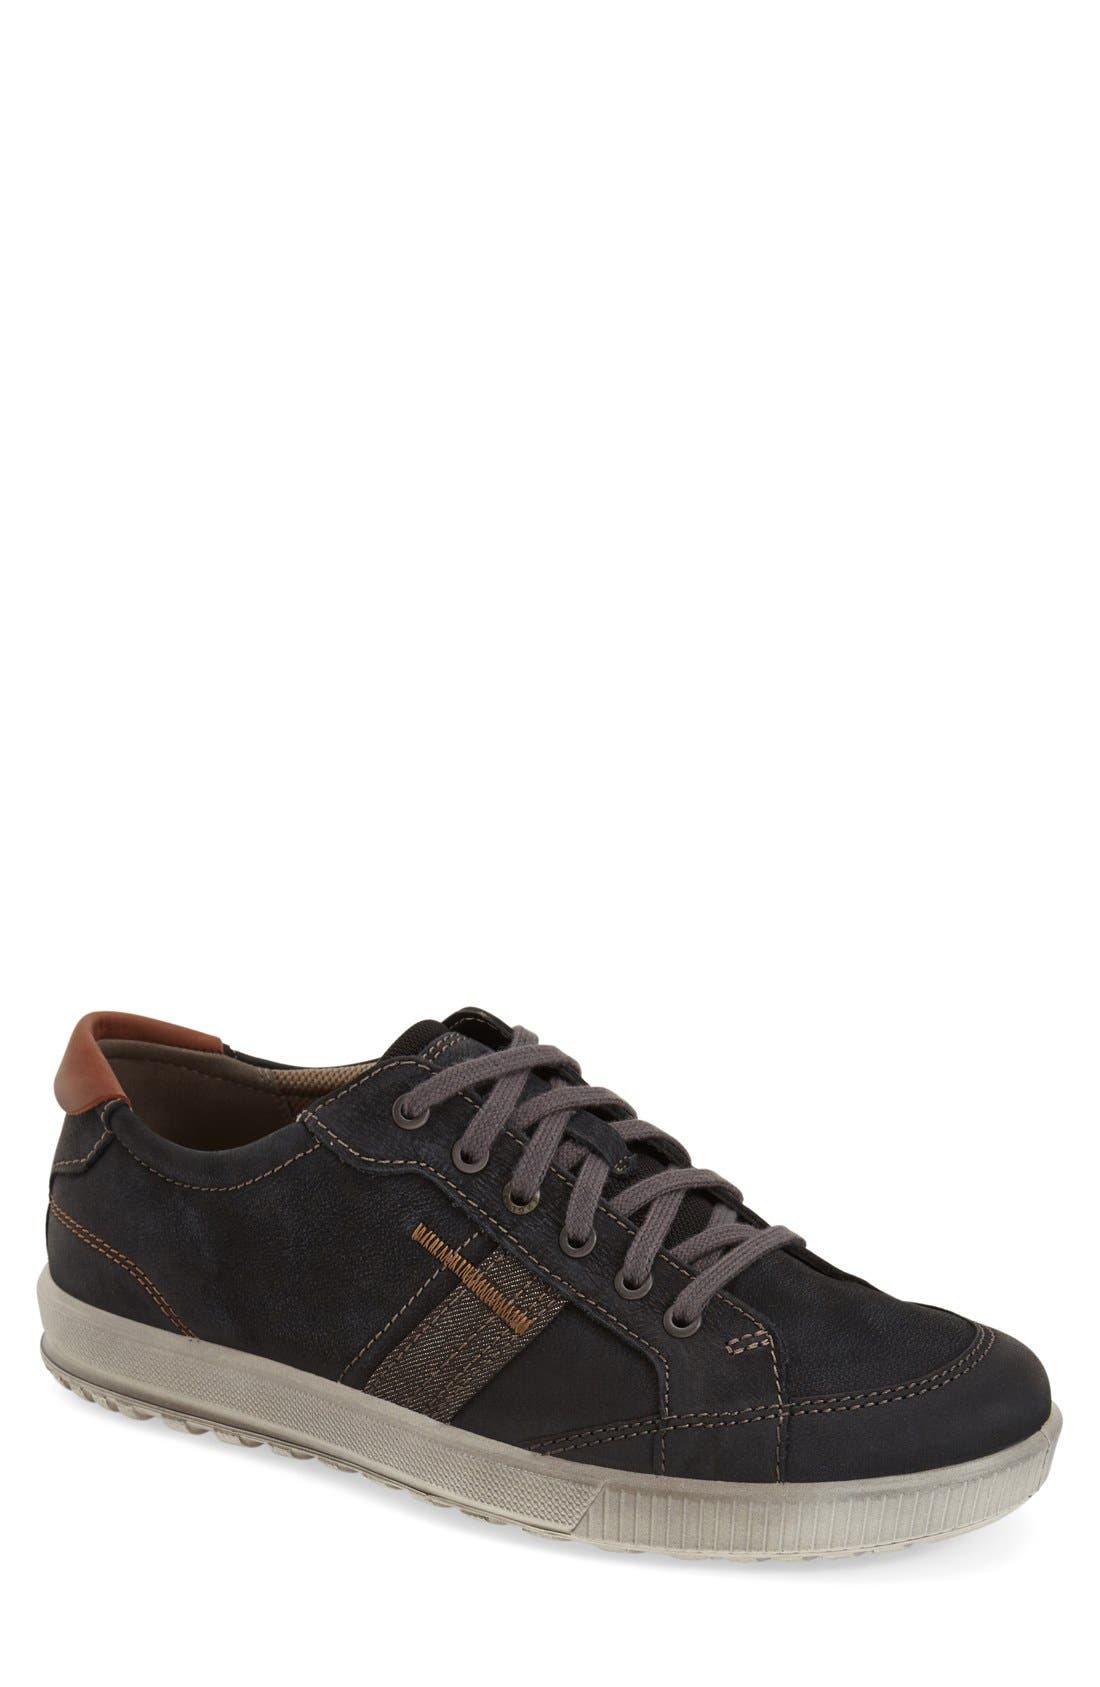 Alternate Image 1 Selected - ECCO 'Ennio Retro' Sneaker (Men)